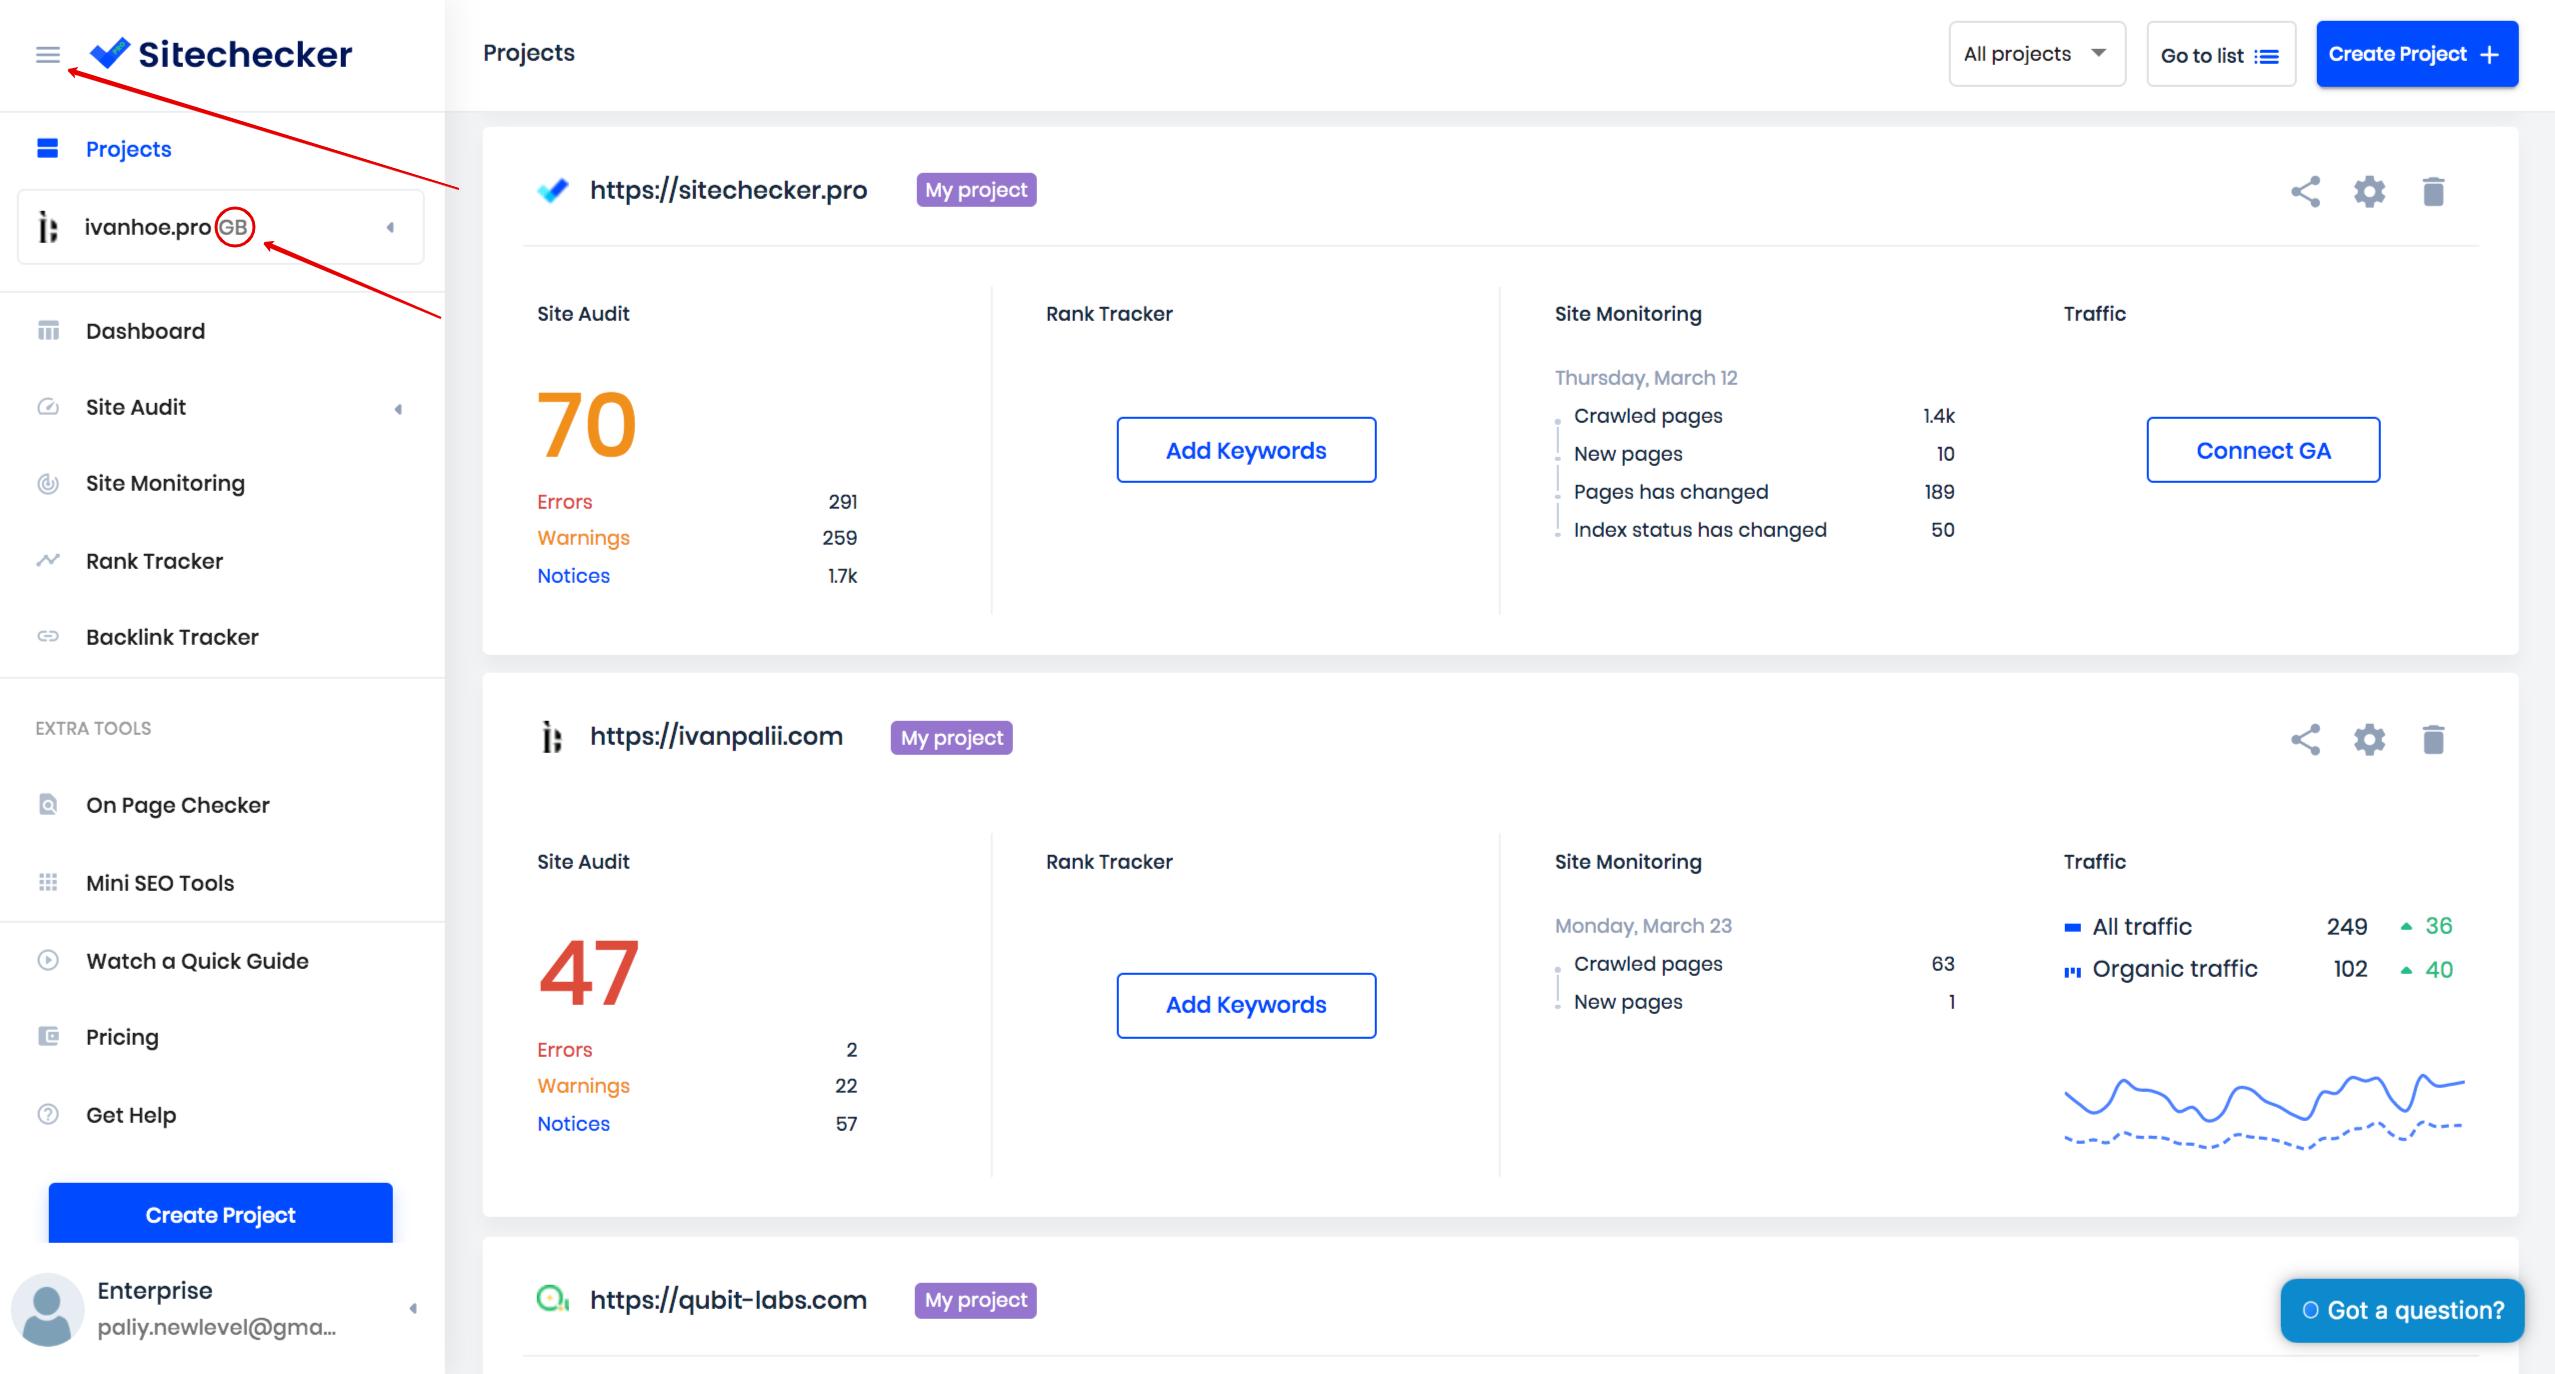 sitechecker design update